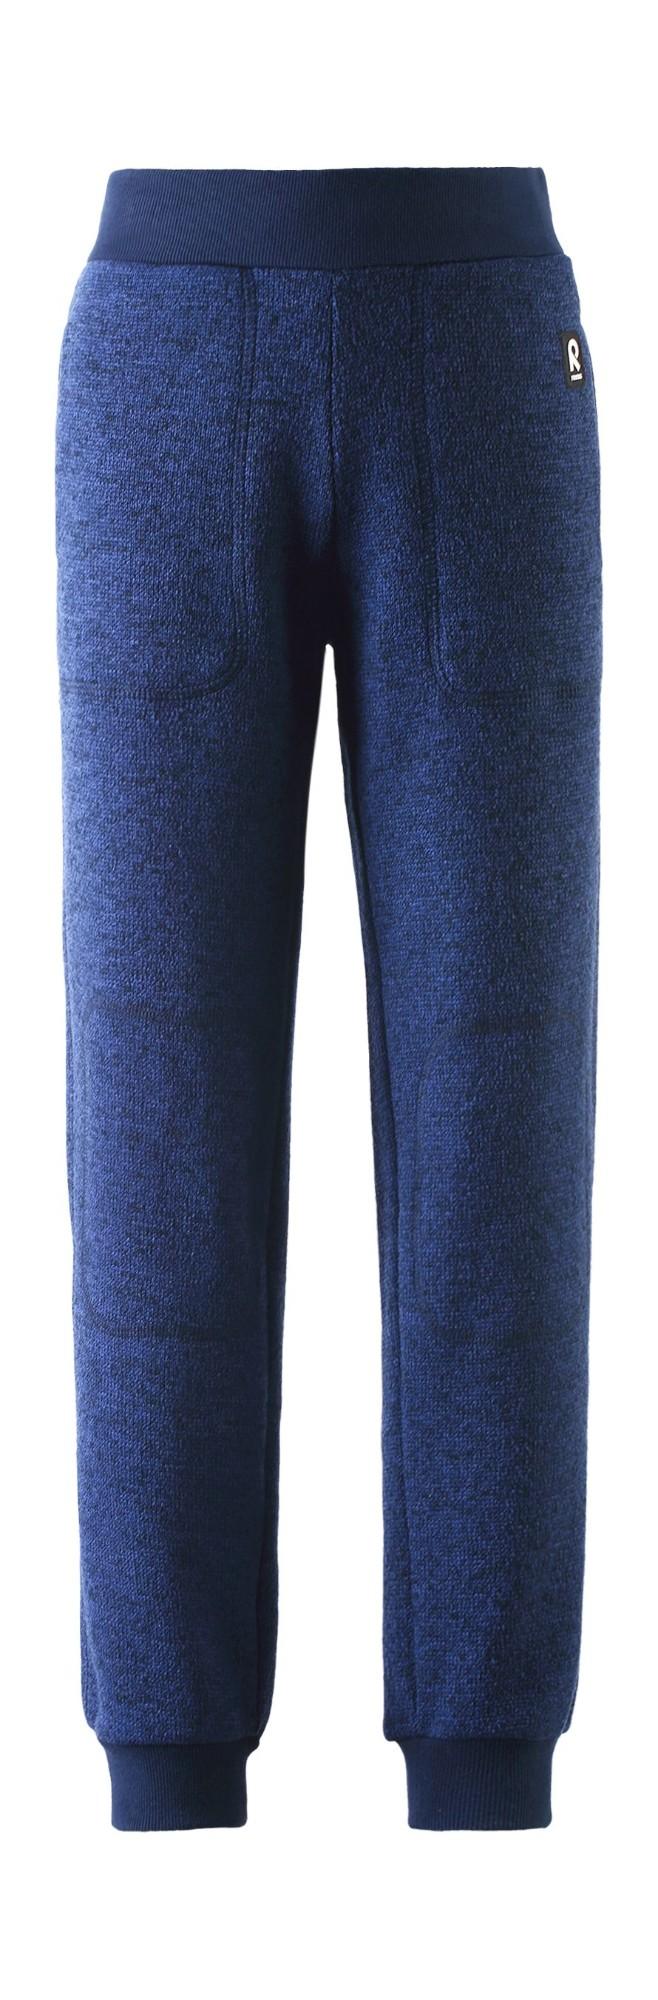 REIMA Sangis Jeans Blue 122